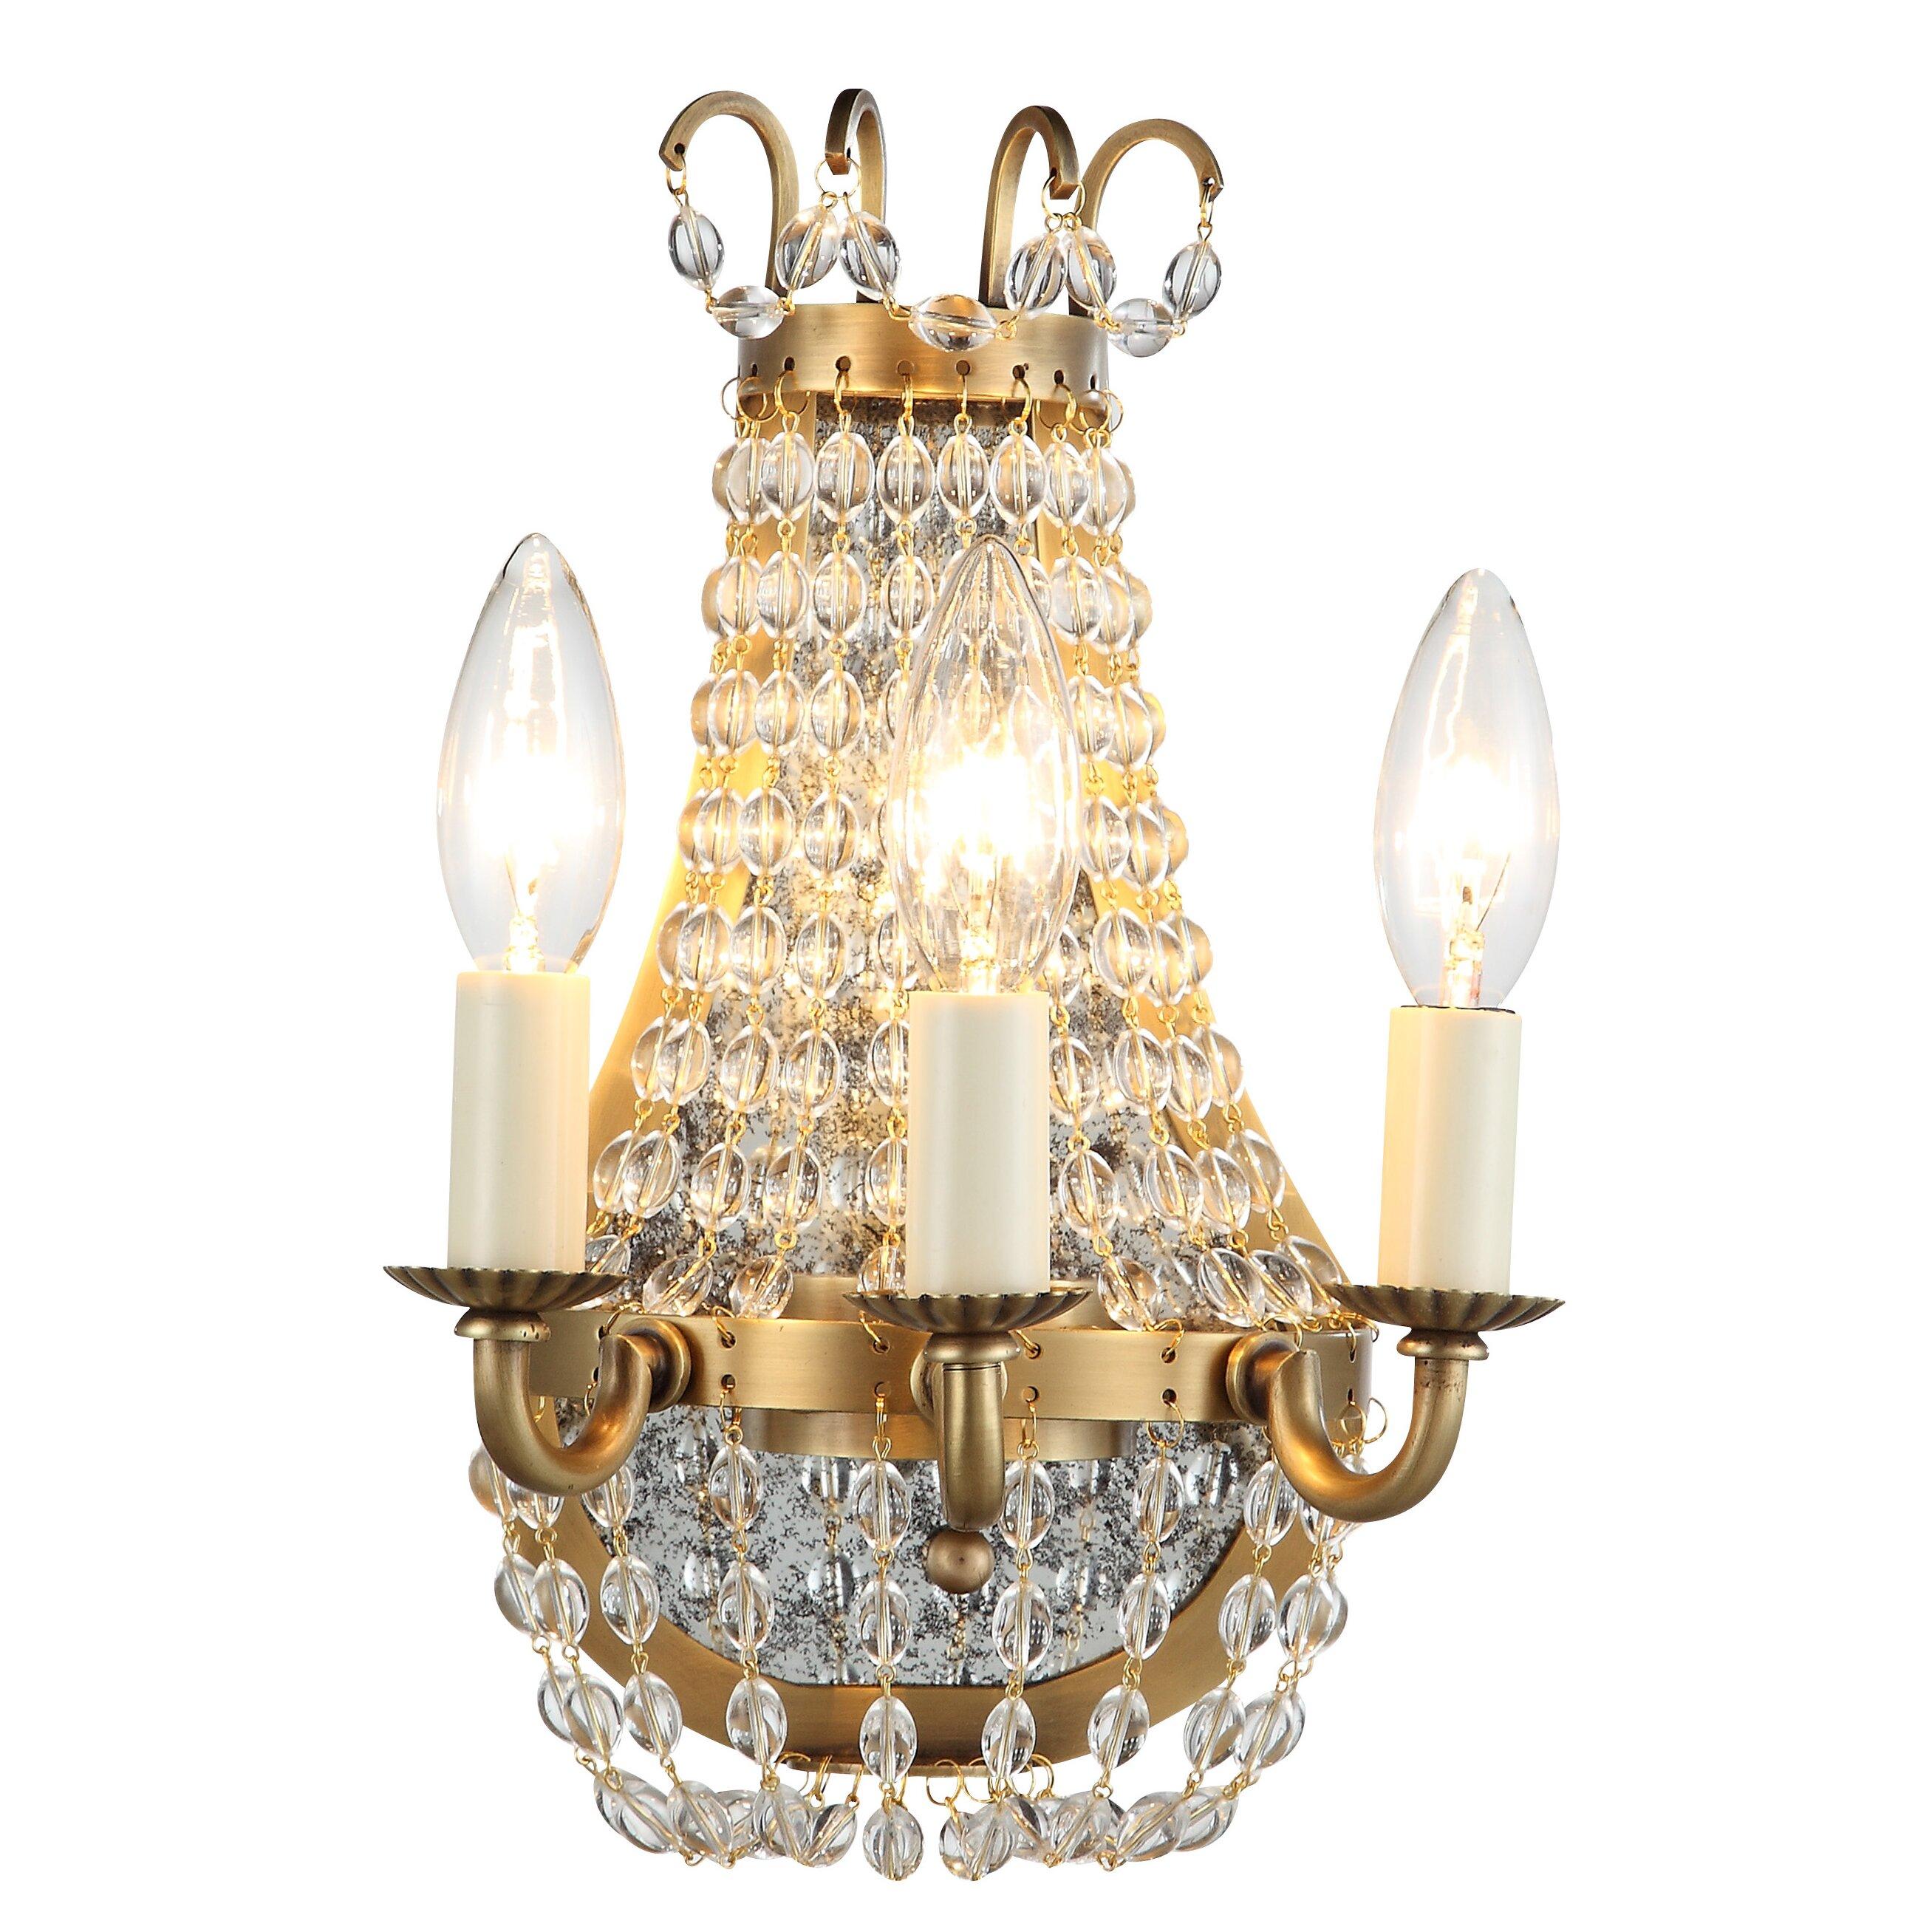 Elegant Lighting Wall Sconces : Elegant Lighting Roma 3 Light Wall Sconce & Reviews Wayfair